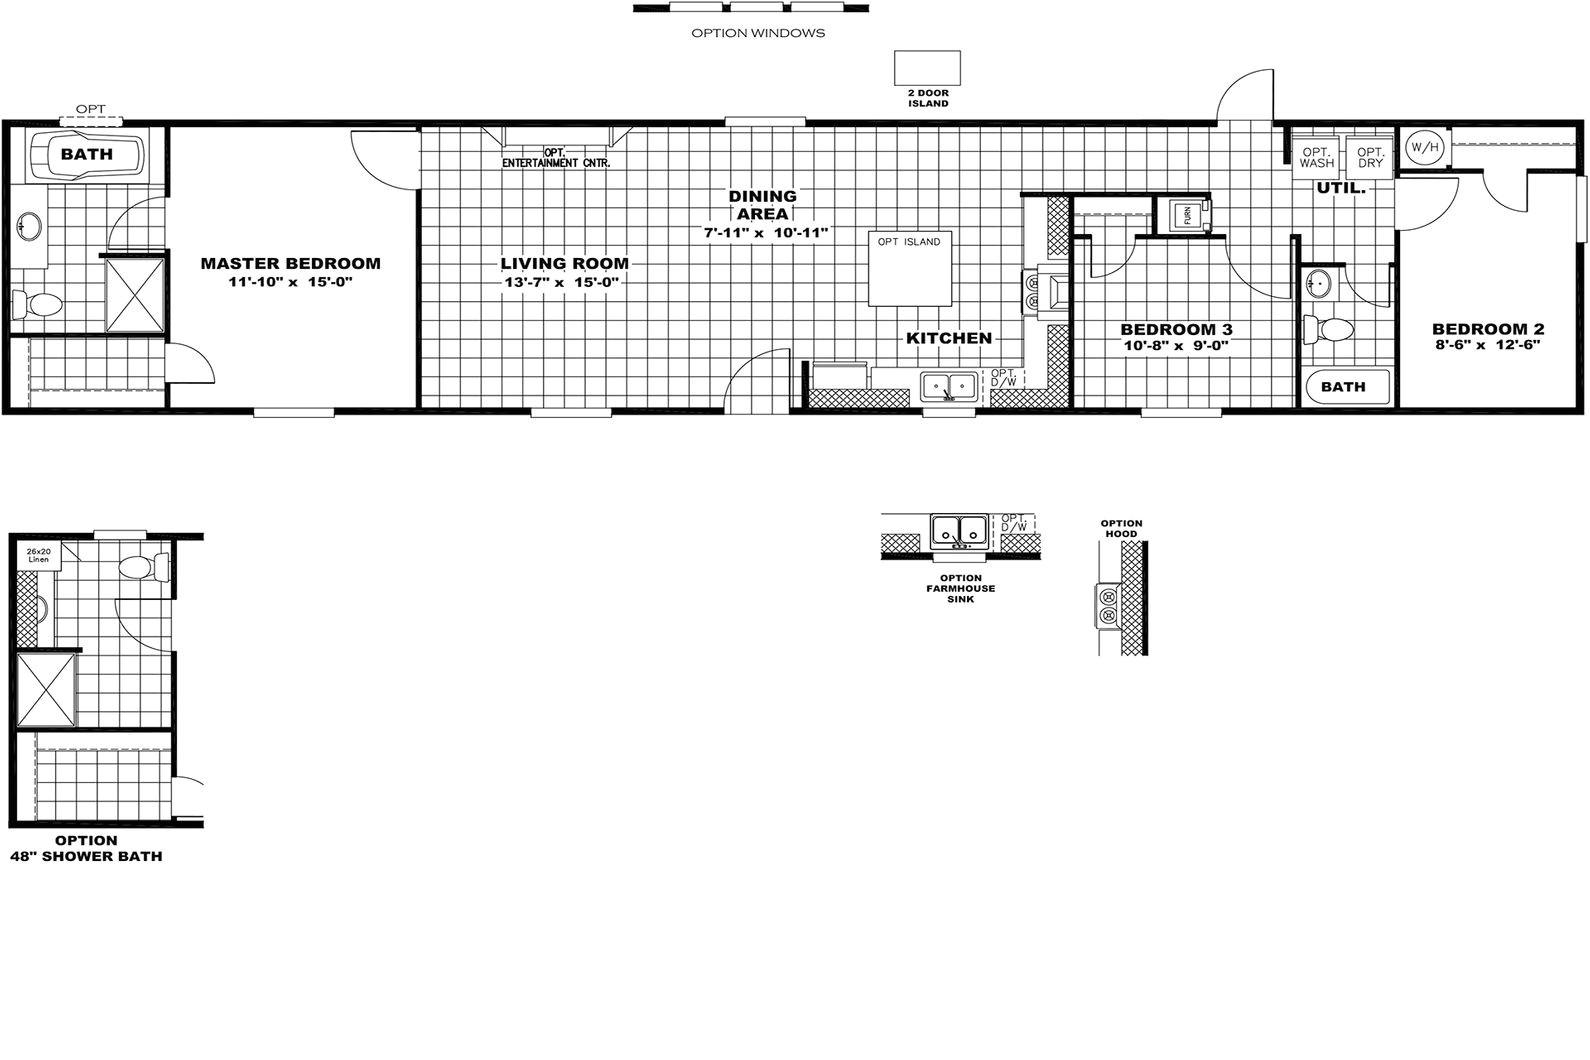 2004 cavalier mobile home floor plans